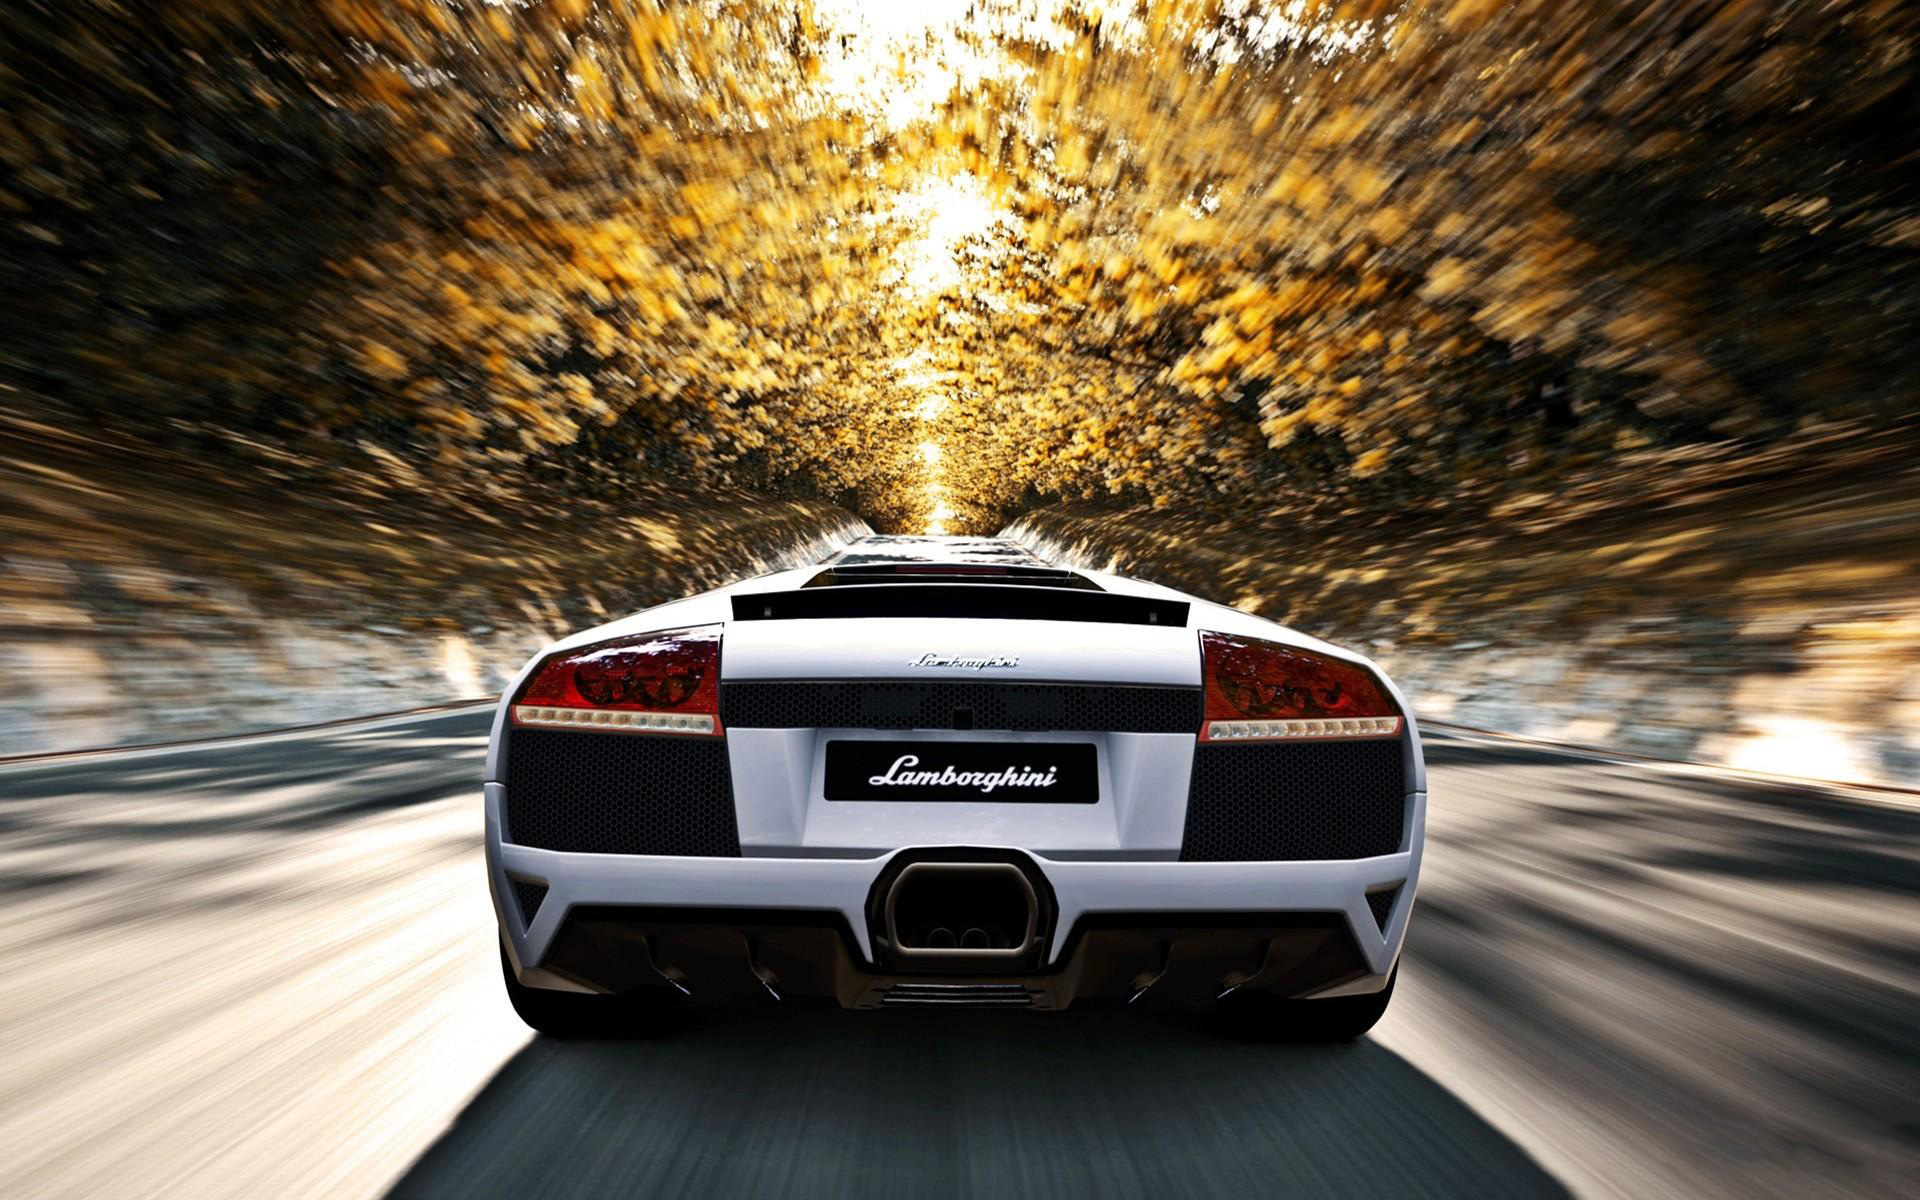 Lamborghini Murcielago LP SuperVeloce Wallpaper Gallery